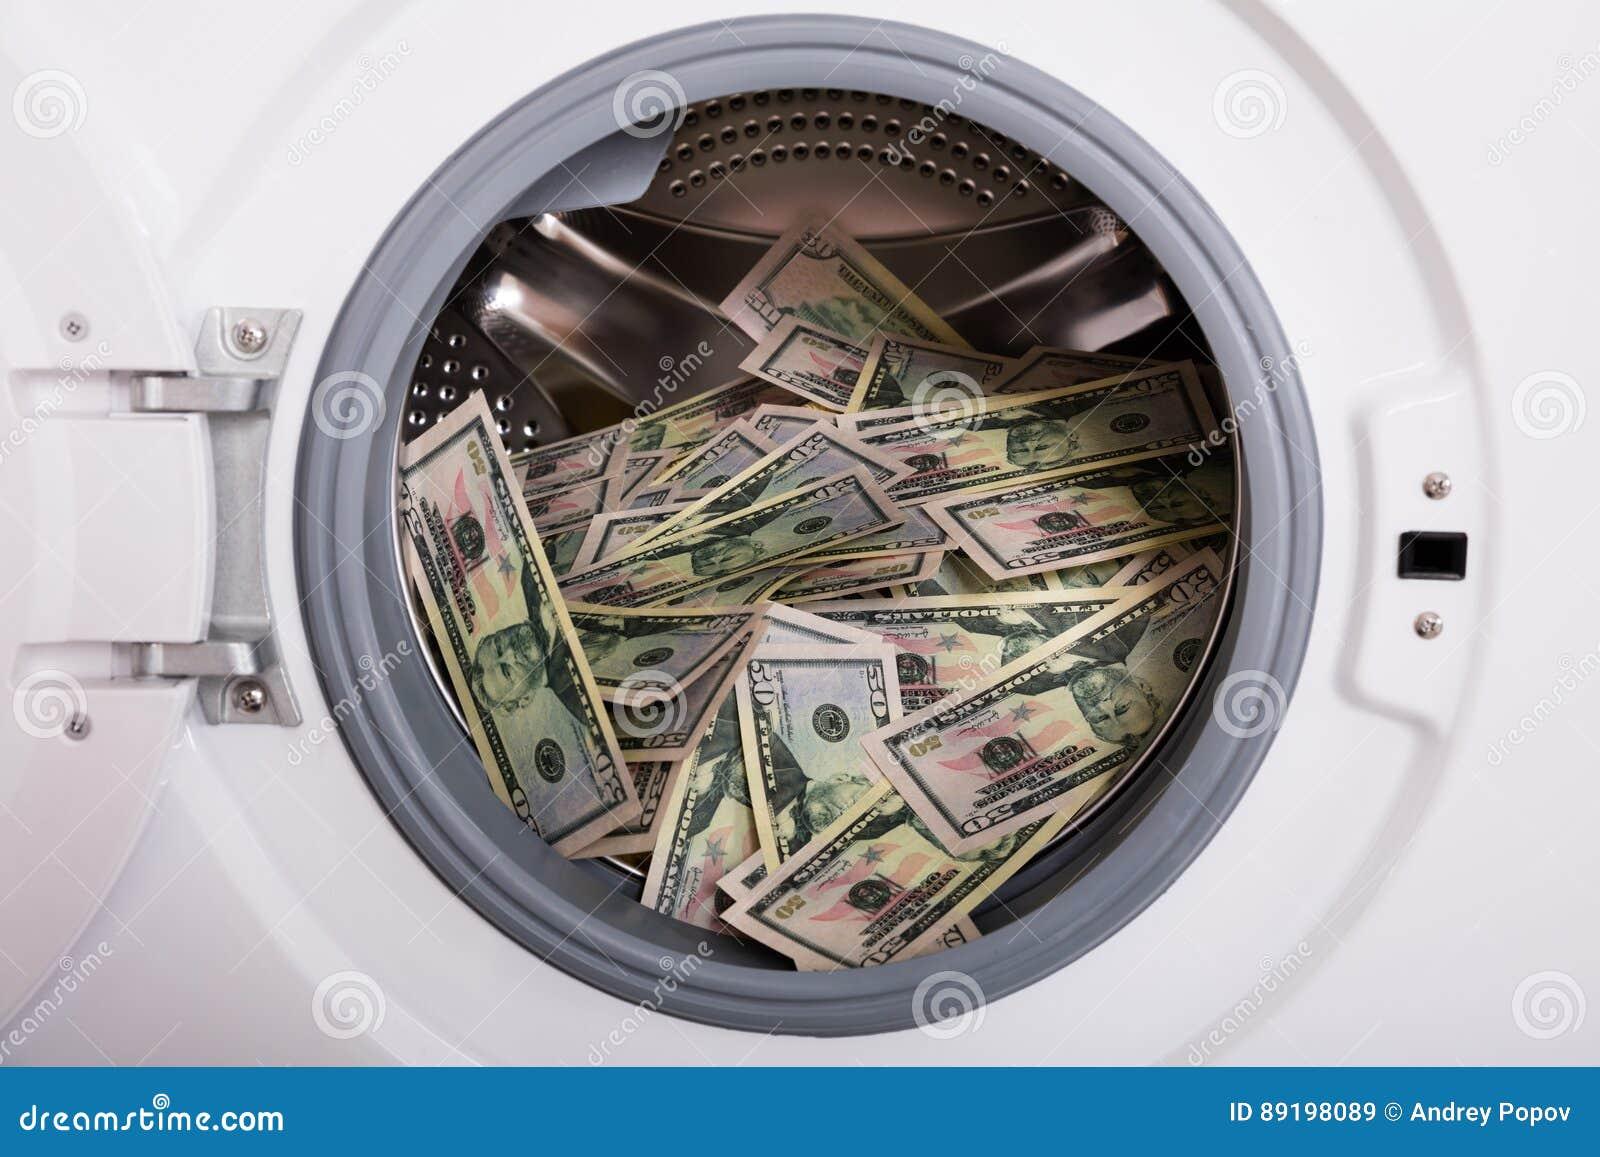 Pile Of Money In Washing Machine